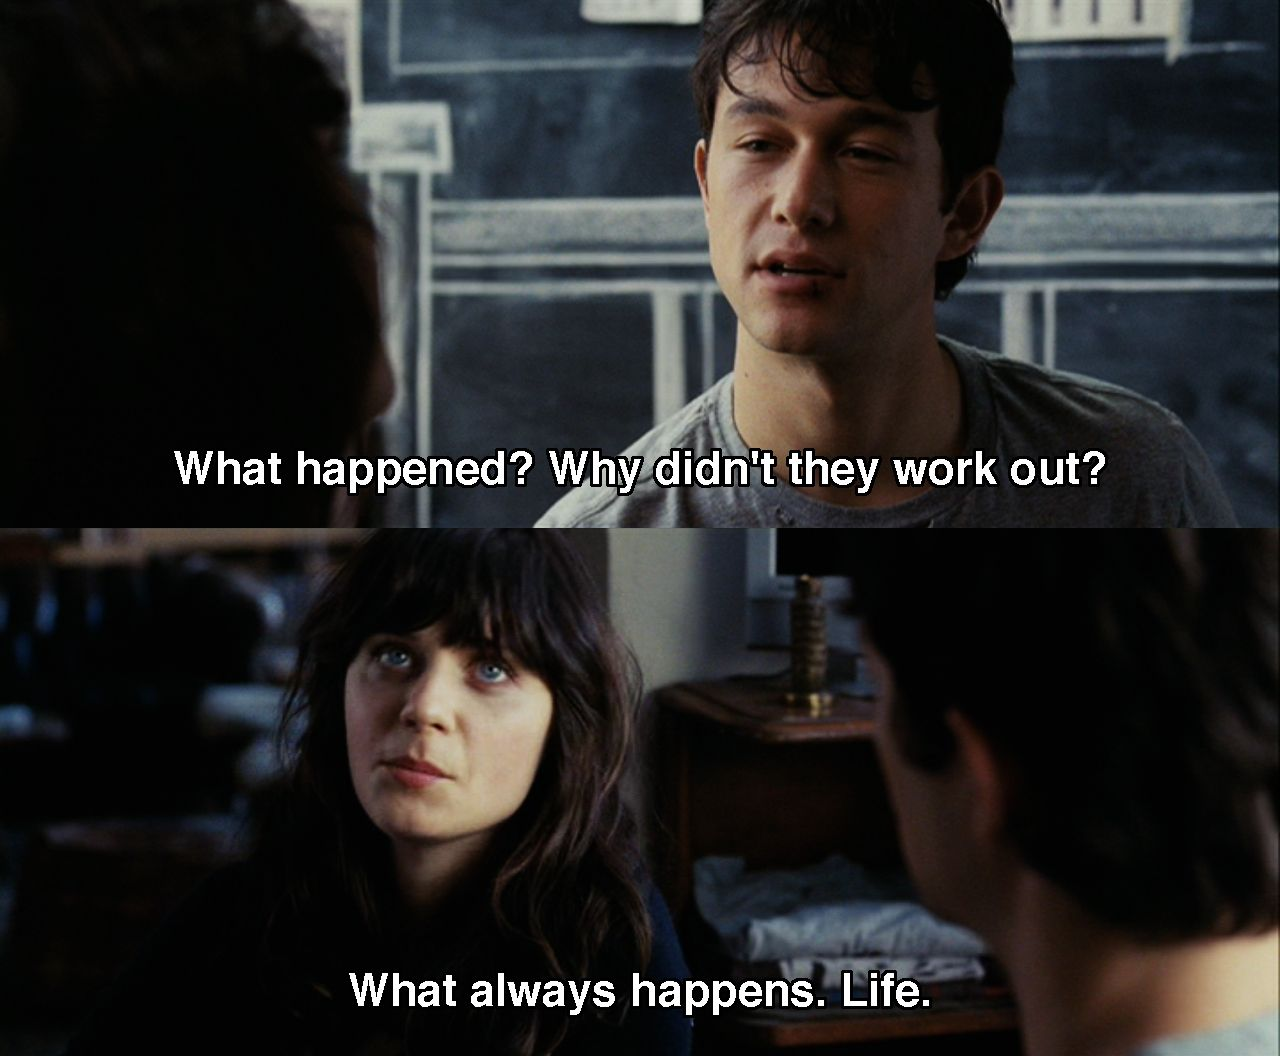 What happened last night movie quote